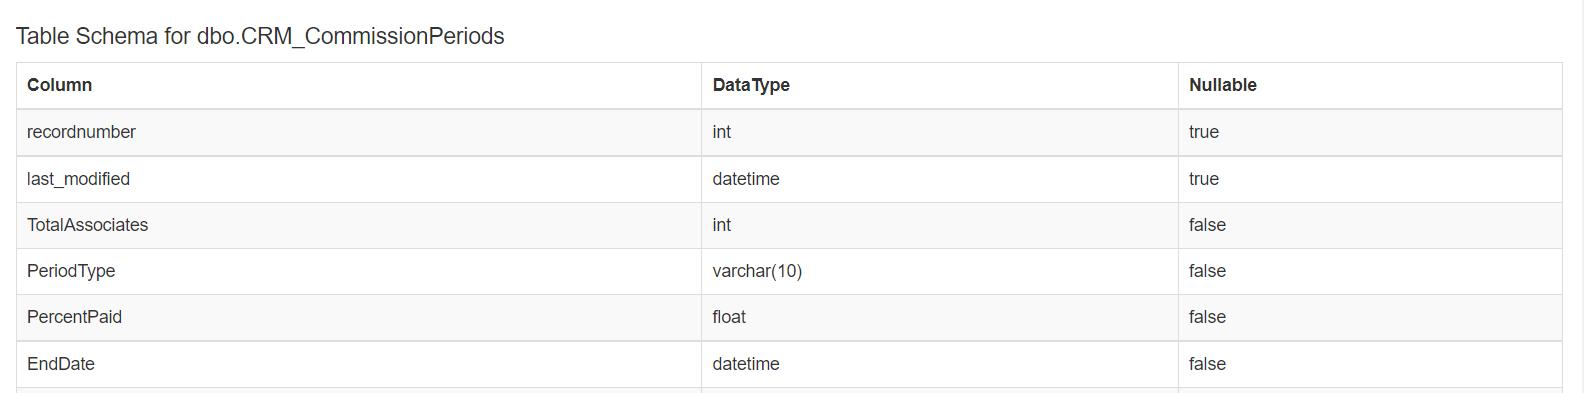 Example table schema